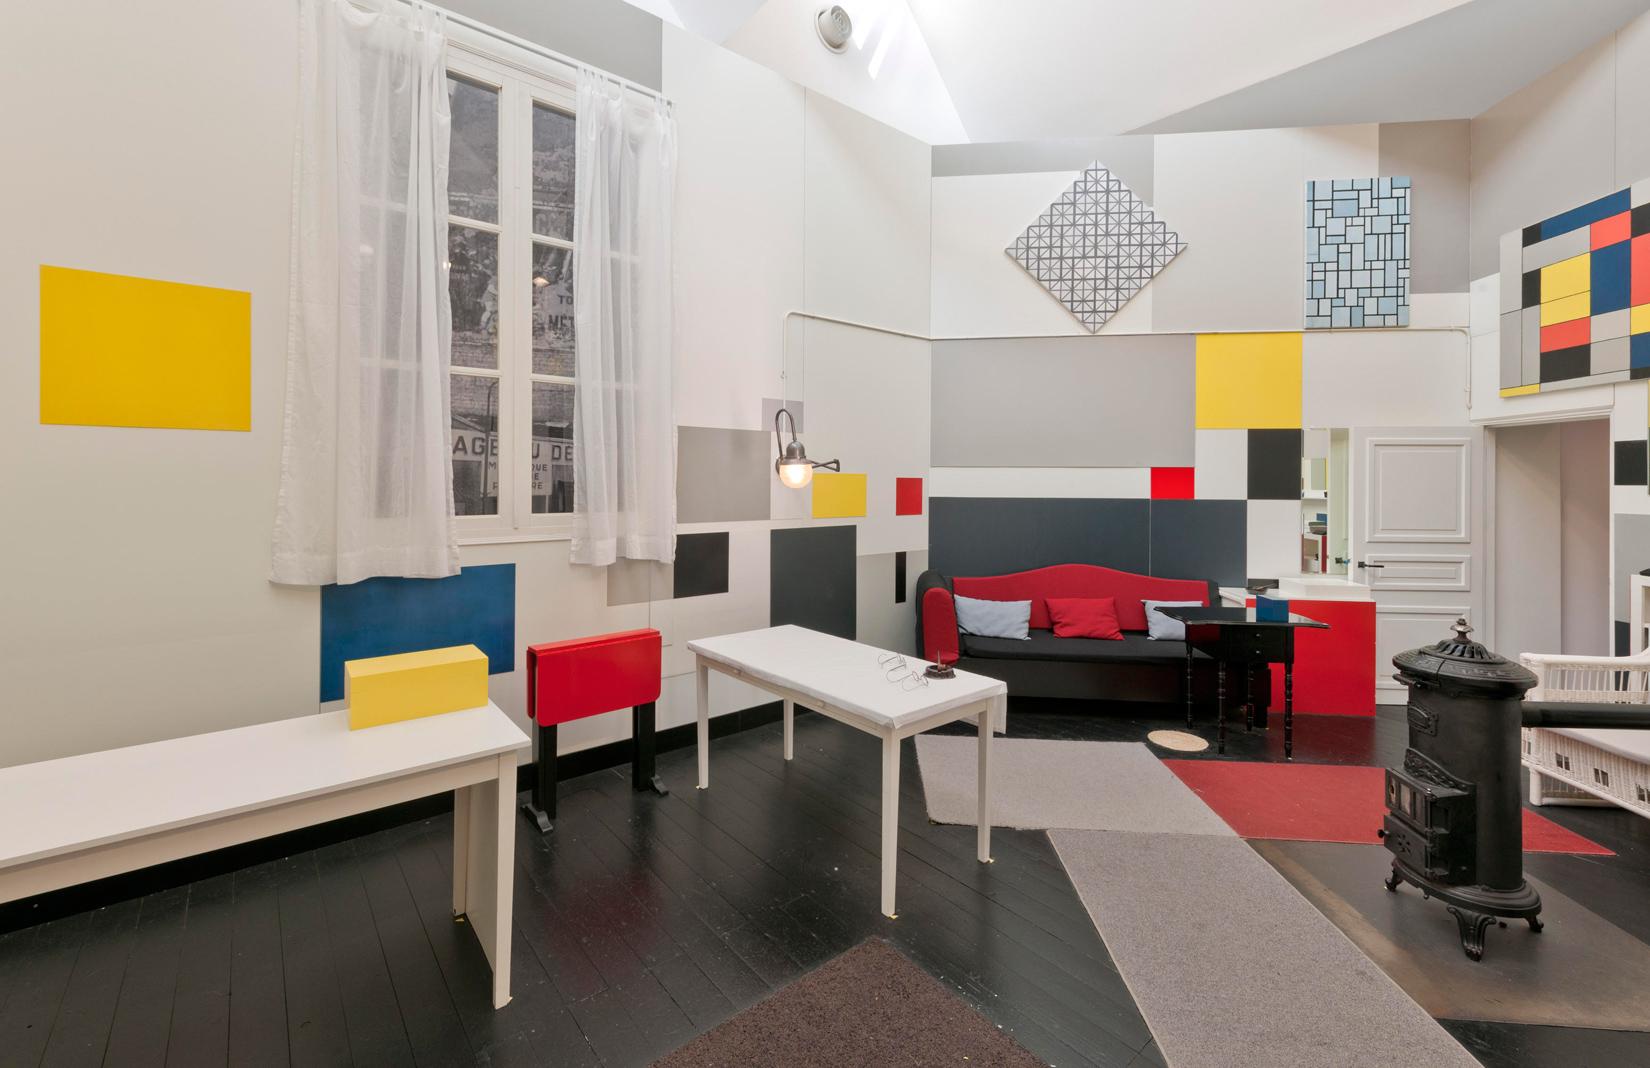 Piet Mondrian's studio recreated at Tate Liverpool